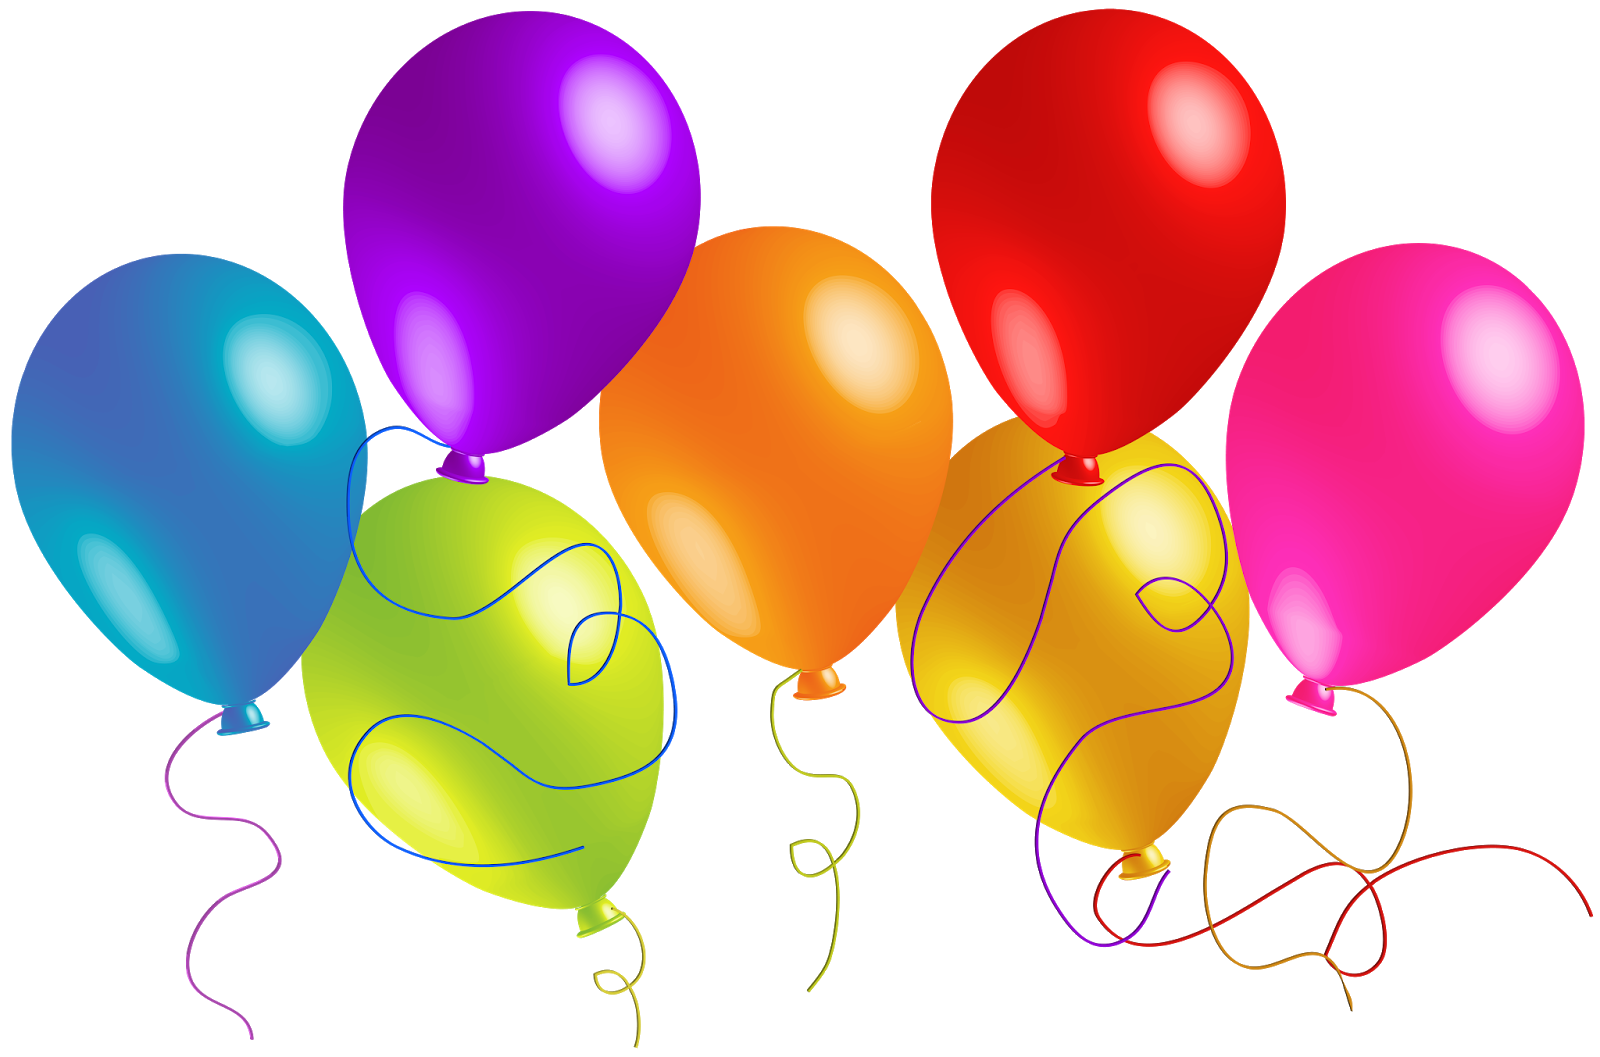 Animated happy anniversary clipart. Clip art clipartfest download